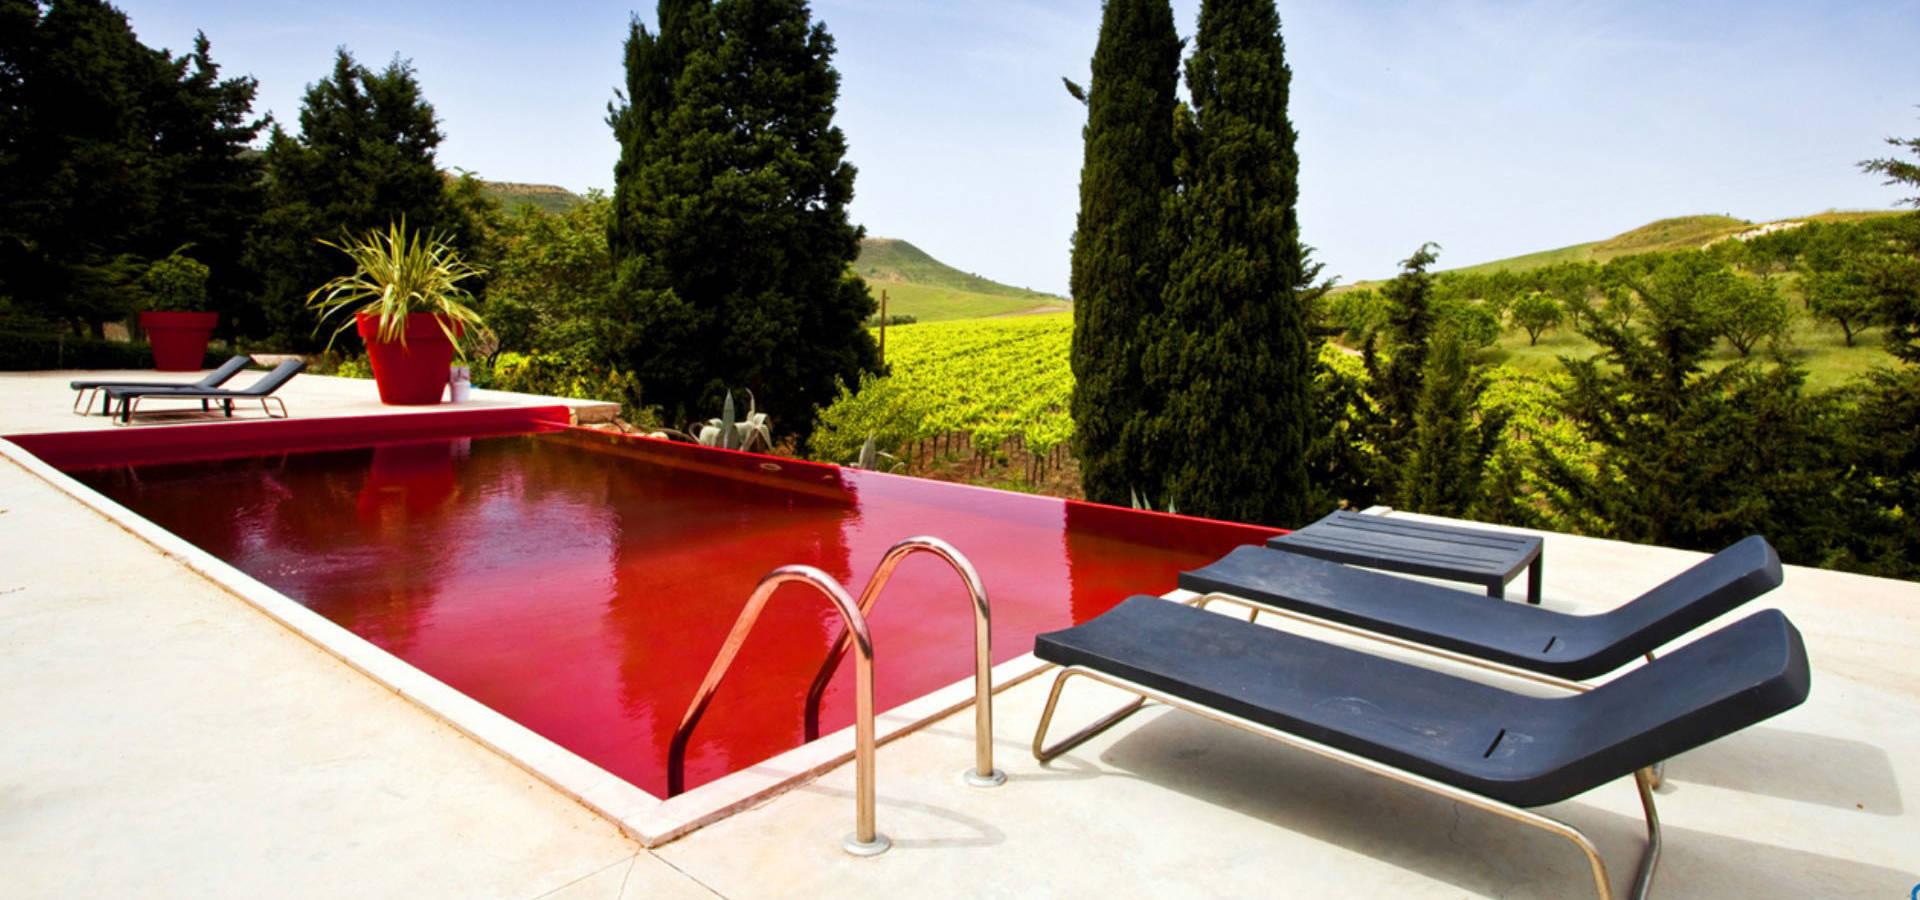 Sicilia Farm Hotel Red Pool Di Olympic Italia